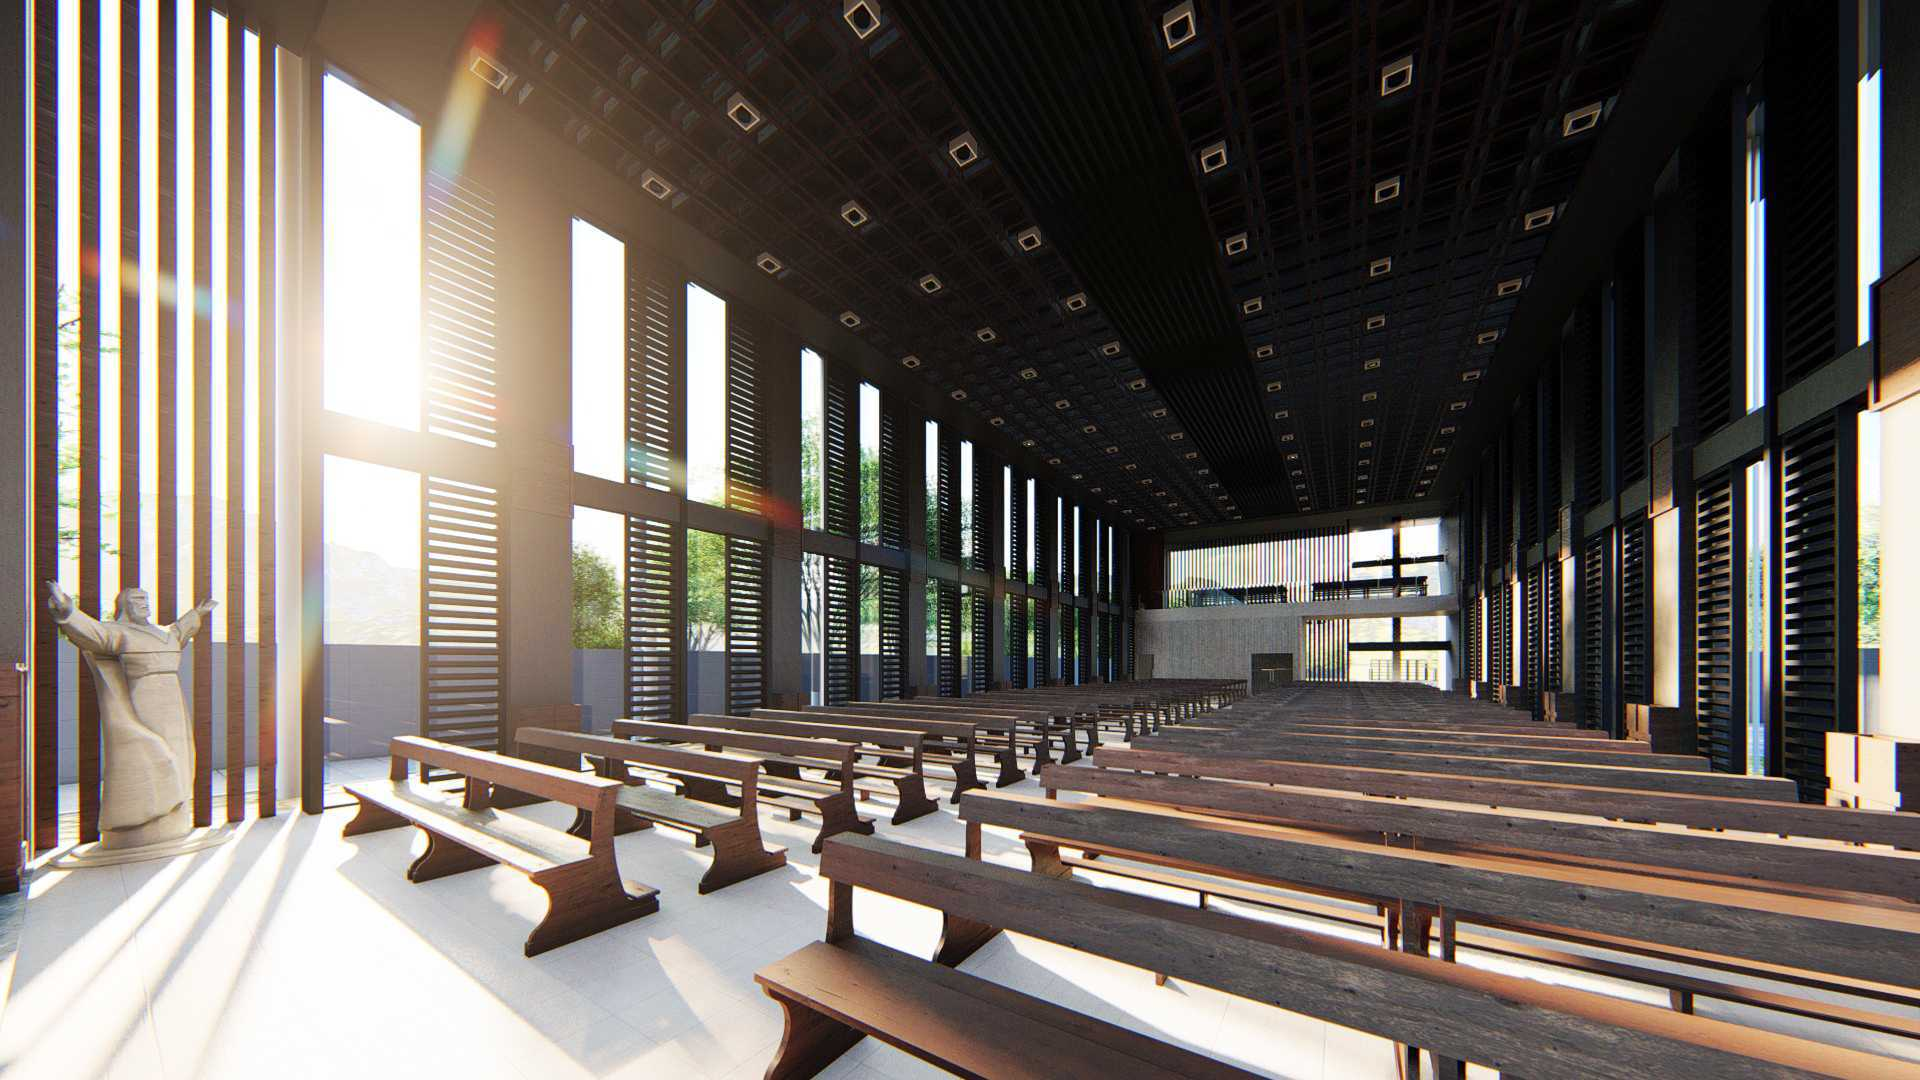 Aeternite Saint Mary Church Comal, Kabupaten Pemalang, Jawa Tengah, Indonesia Comal, Kabupaten Pemalang, Jawa Tengah, Indonesia Aeternite-Saint-Mary-Church   56493